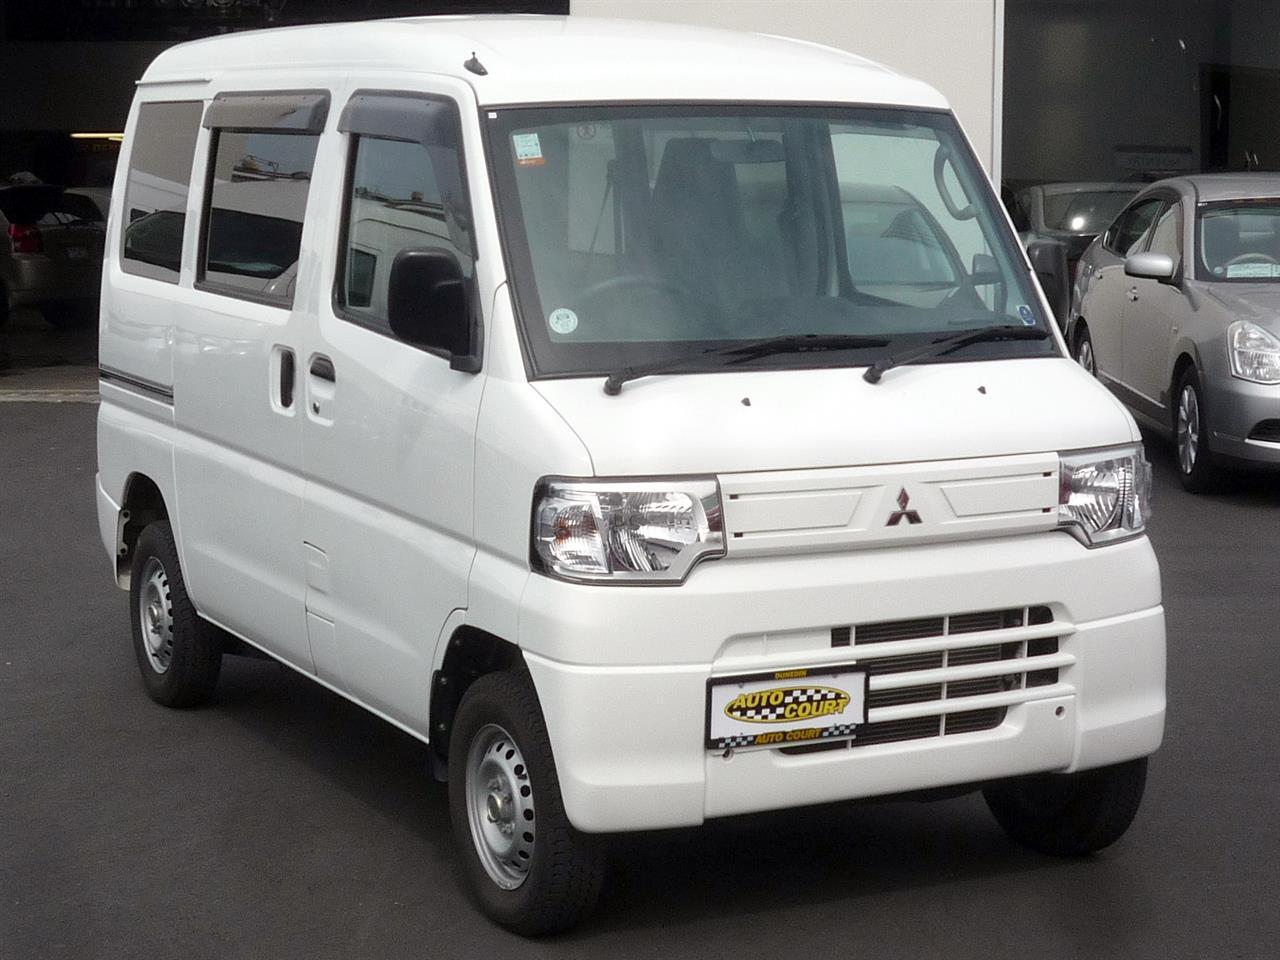 image-9, 2013 Mitsubishi MiniCab MiEV Electric Van at Dunedin